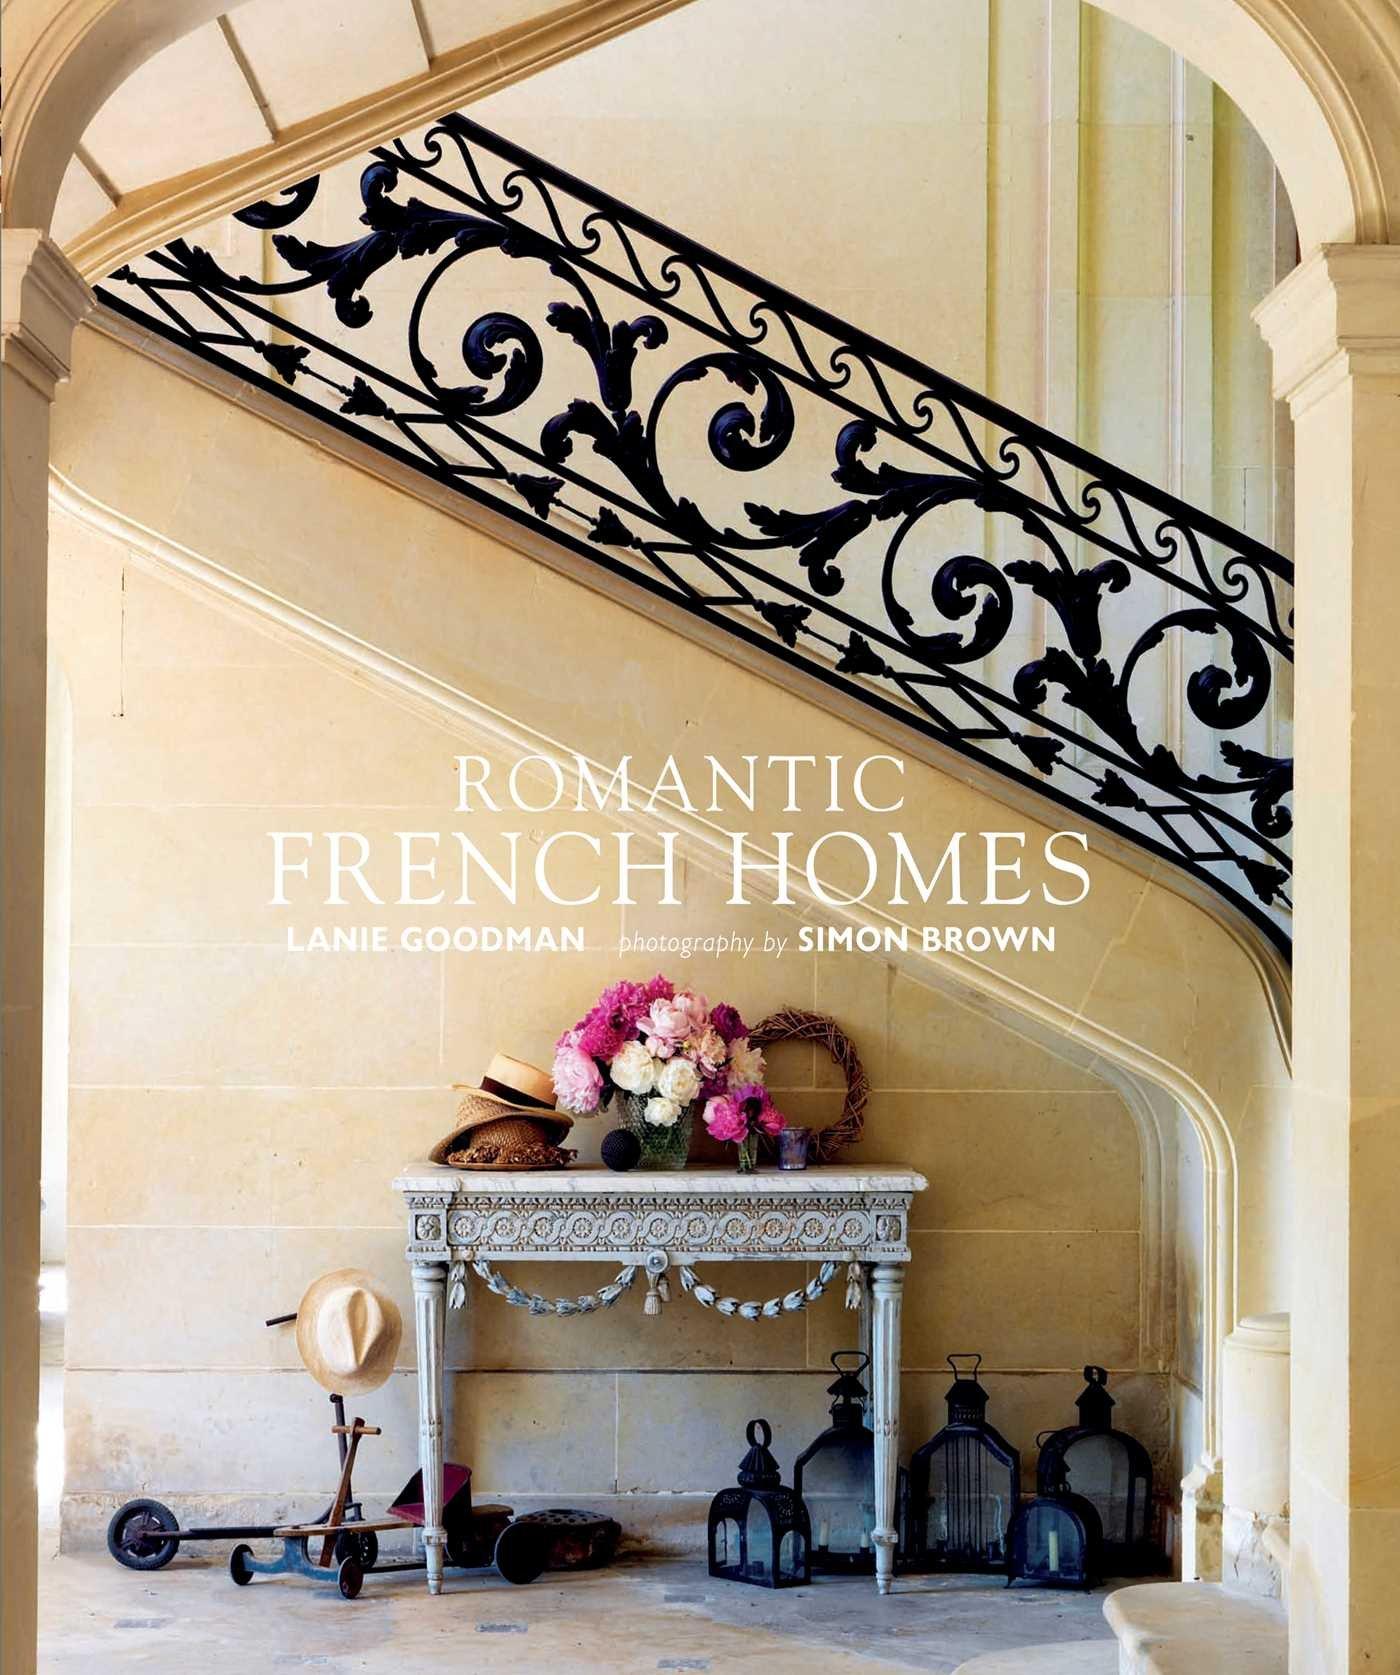 romantic french homes lanie goodman 9781908862761 amazon com books